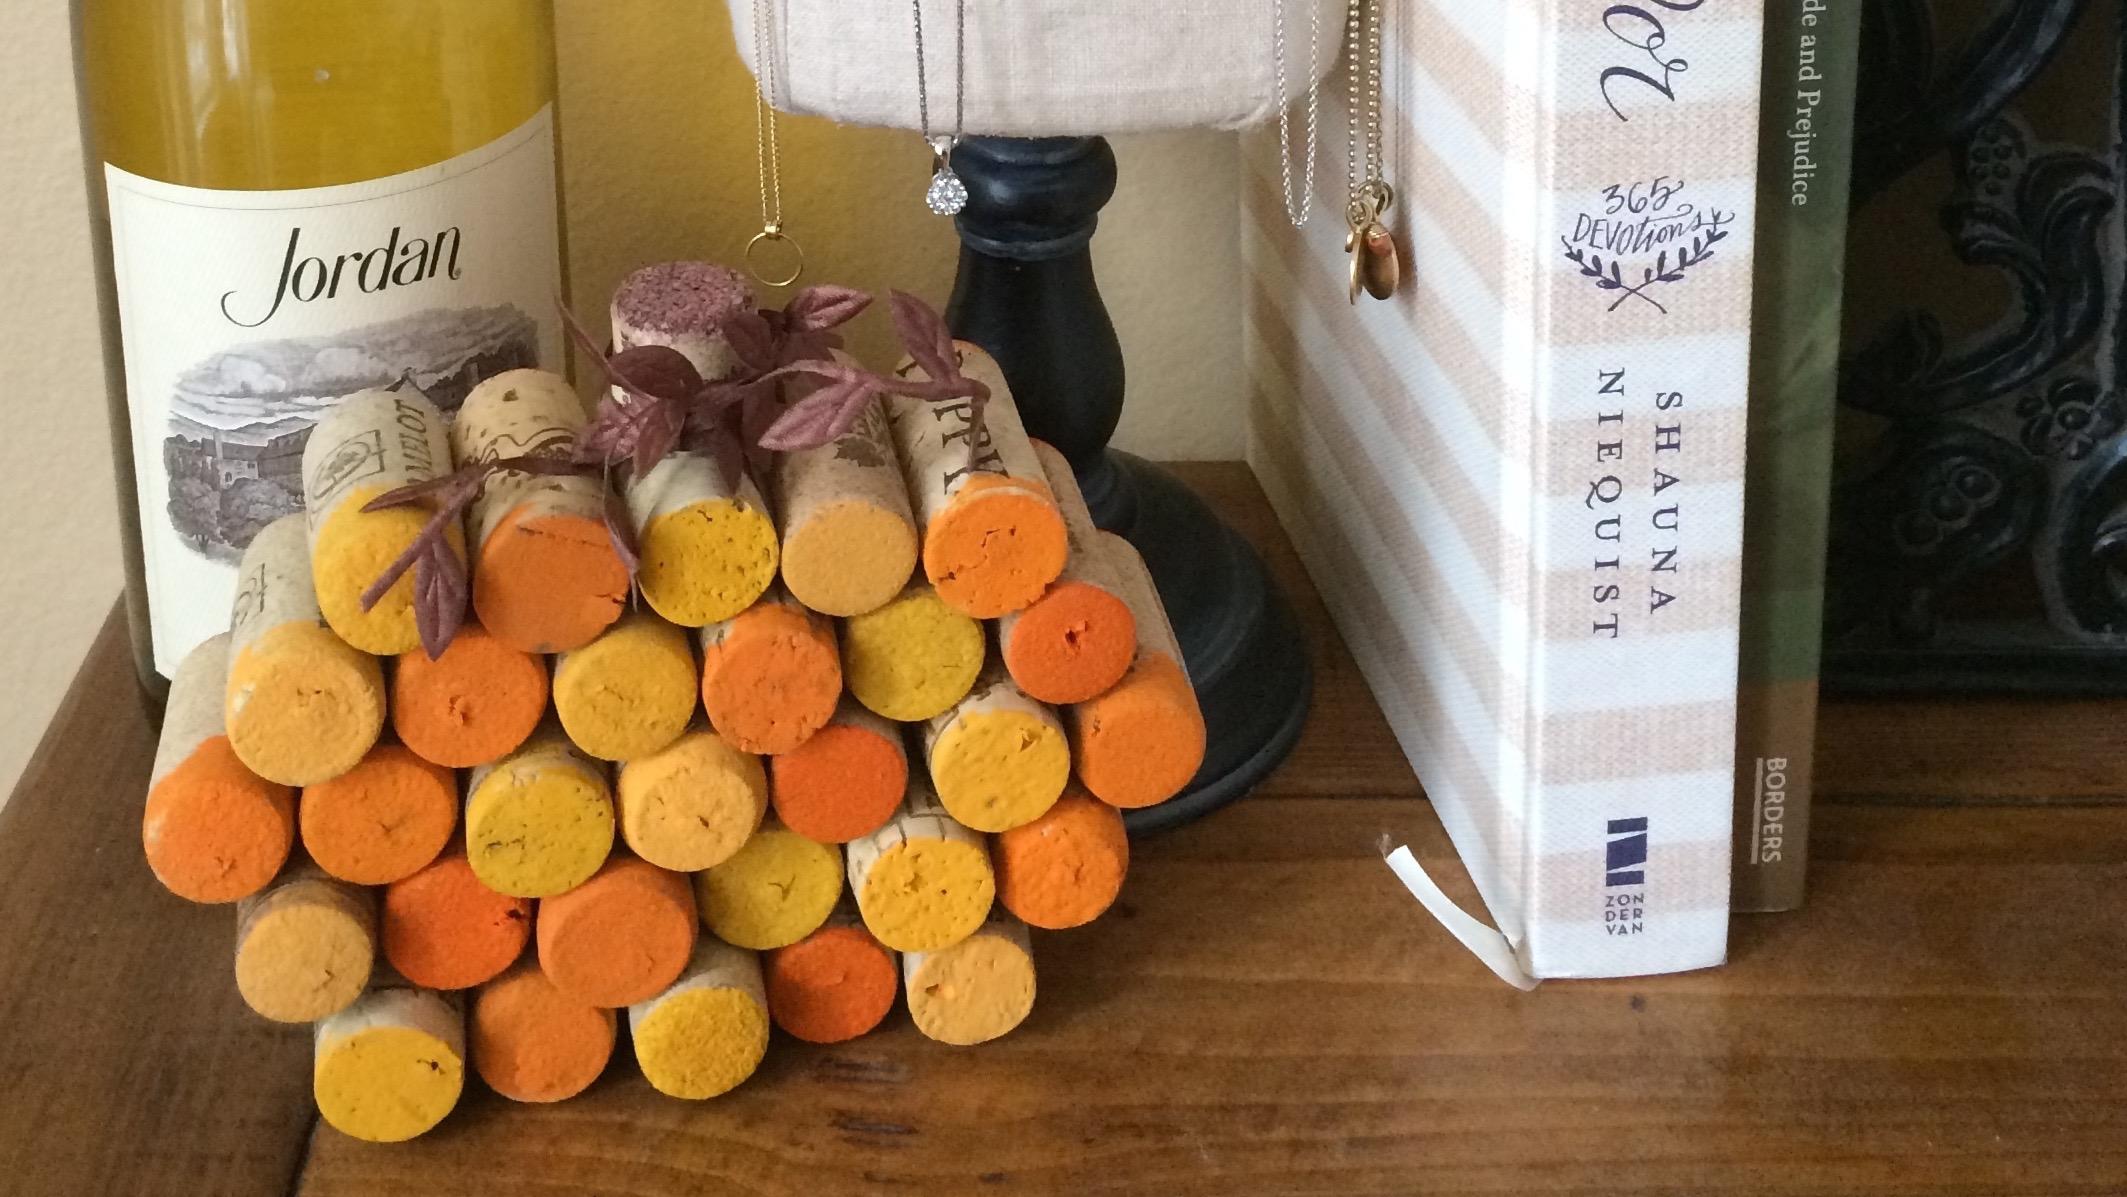 DIY Wine Cork Pumpkin on Display with Wine